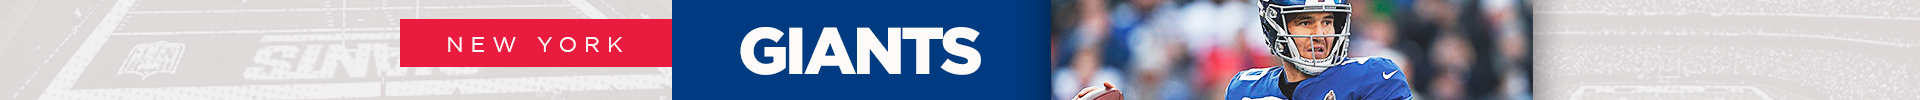 Times - Giants